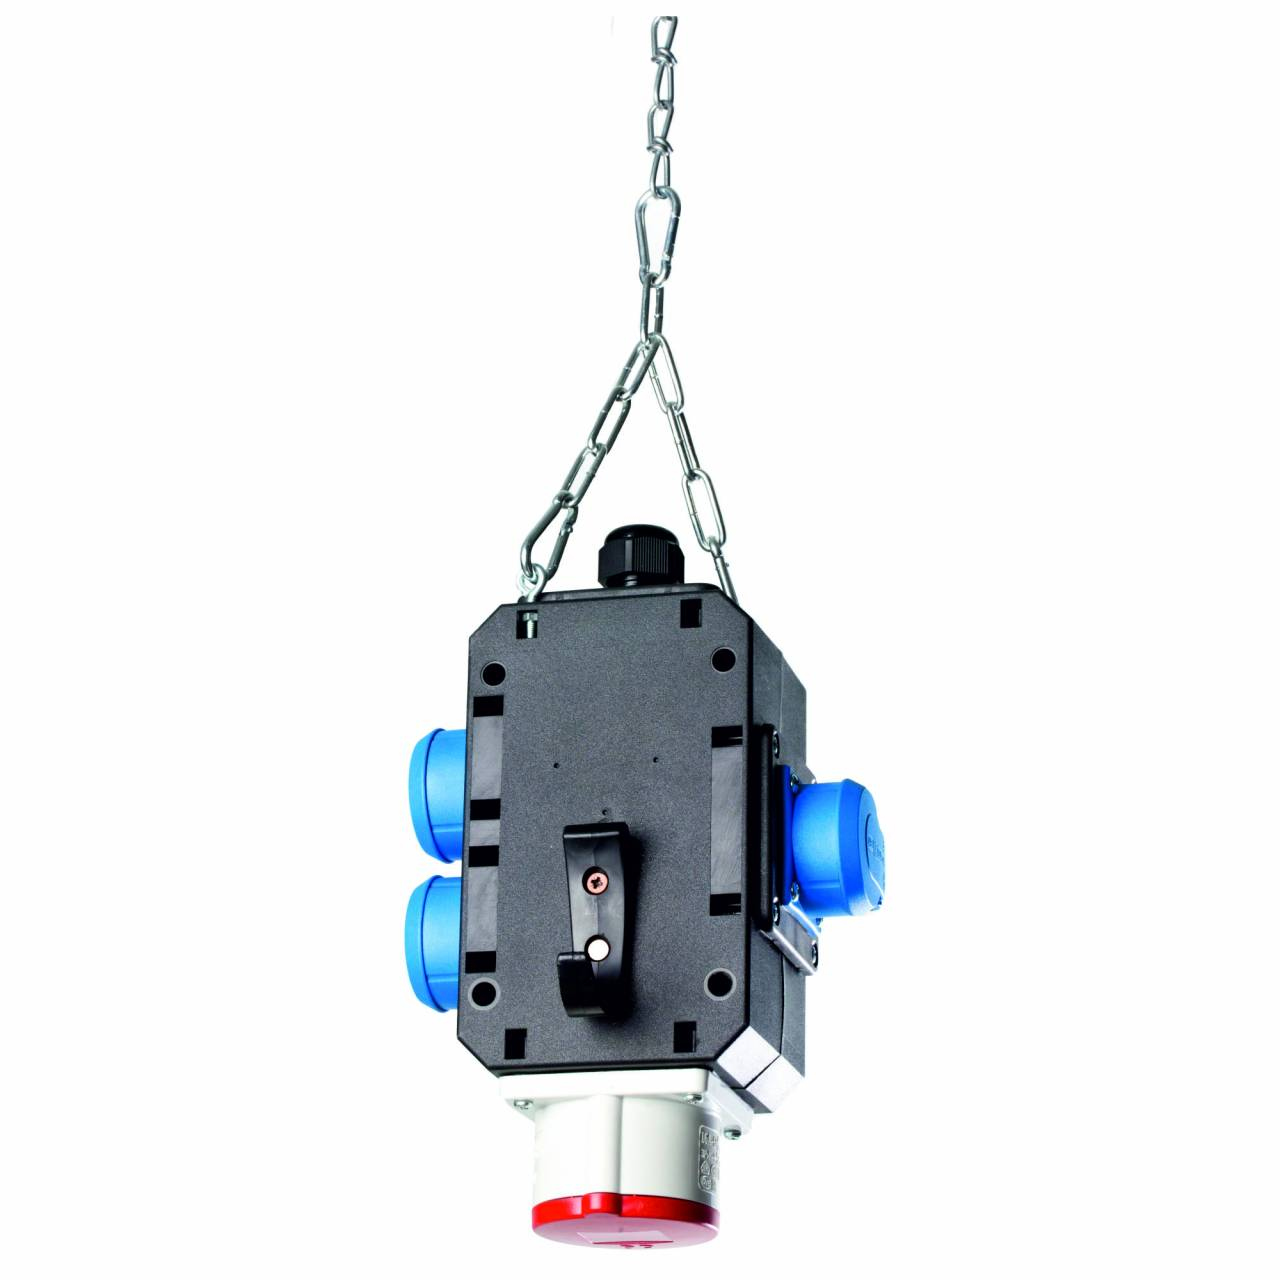 Energiewürfel: 3 x Schuko 230V, 16A + 1 x CEE 400V, 16A